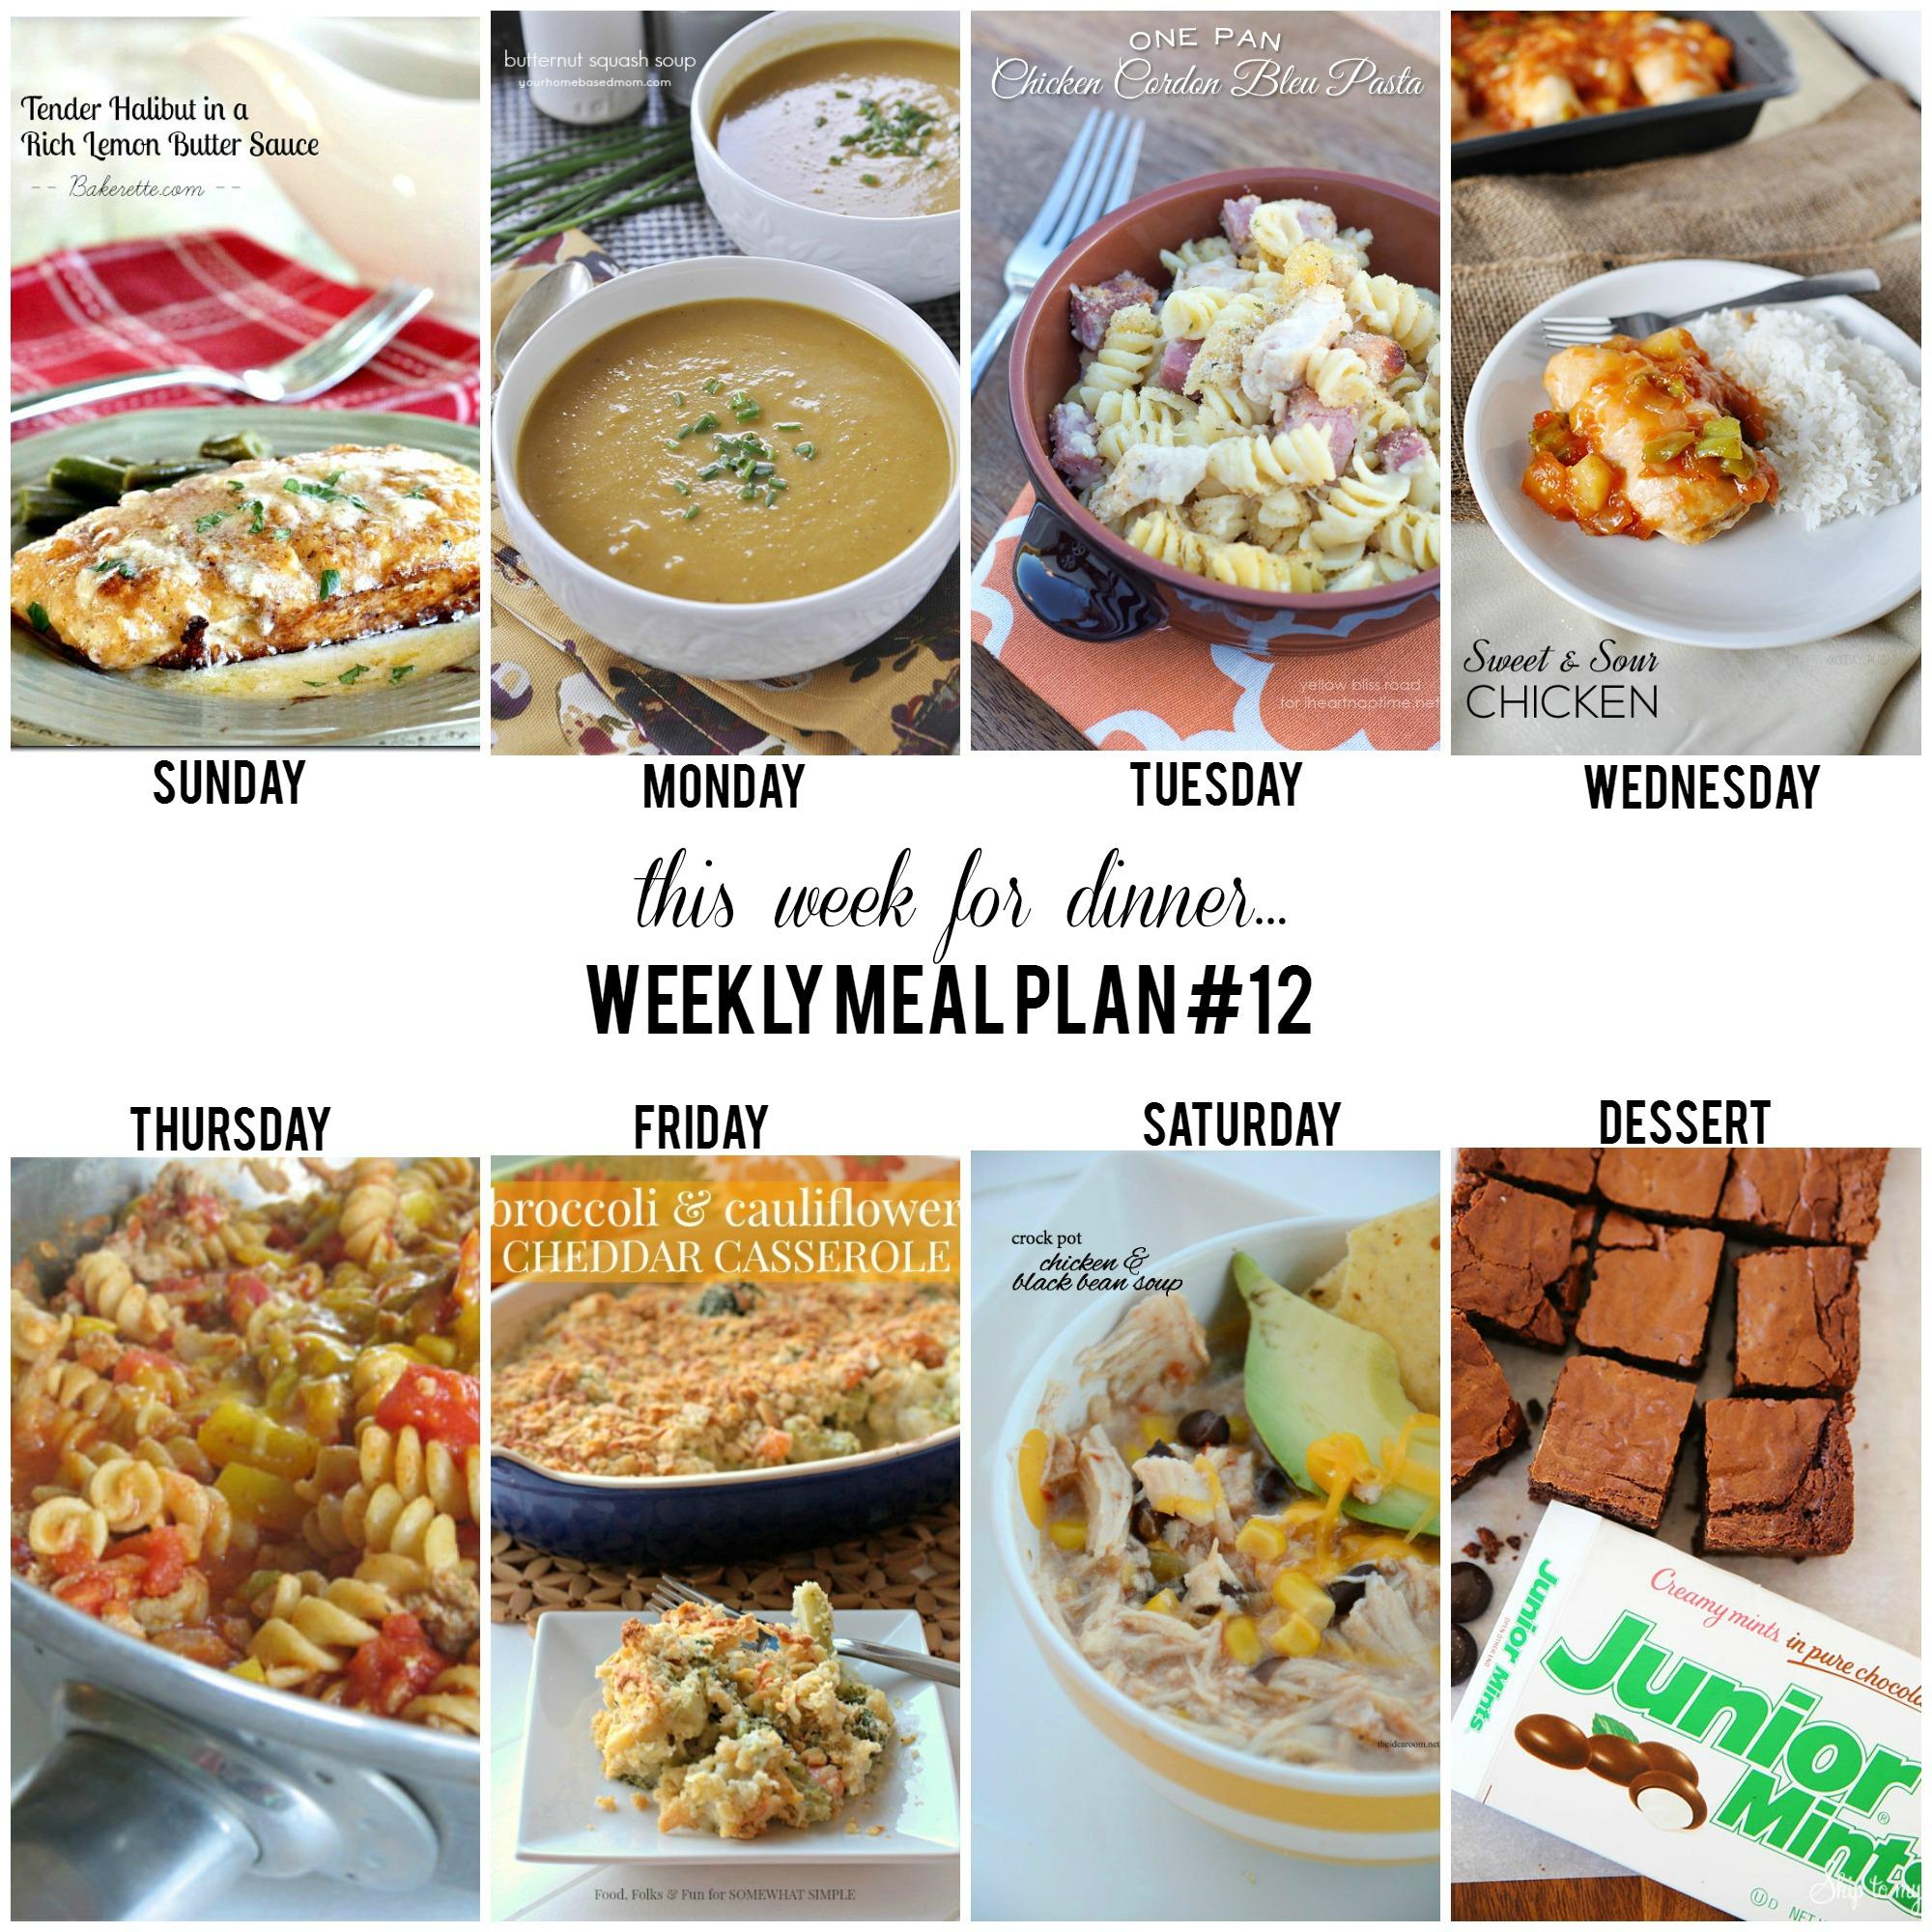 This Week For Dinner Weekly Meal Plan